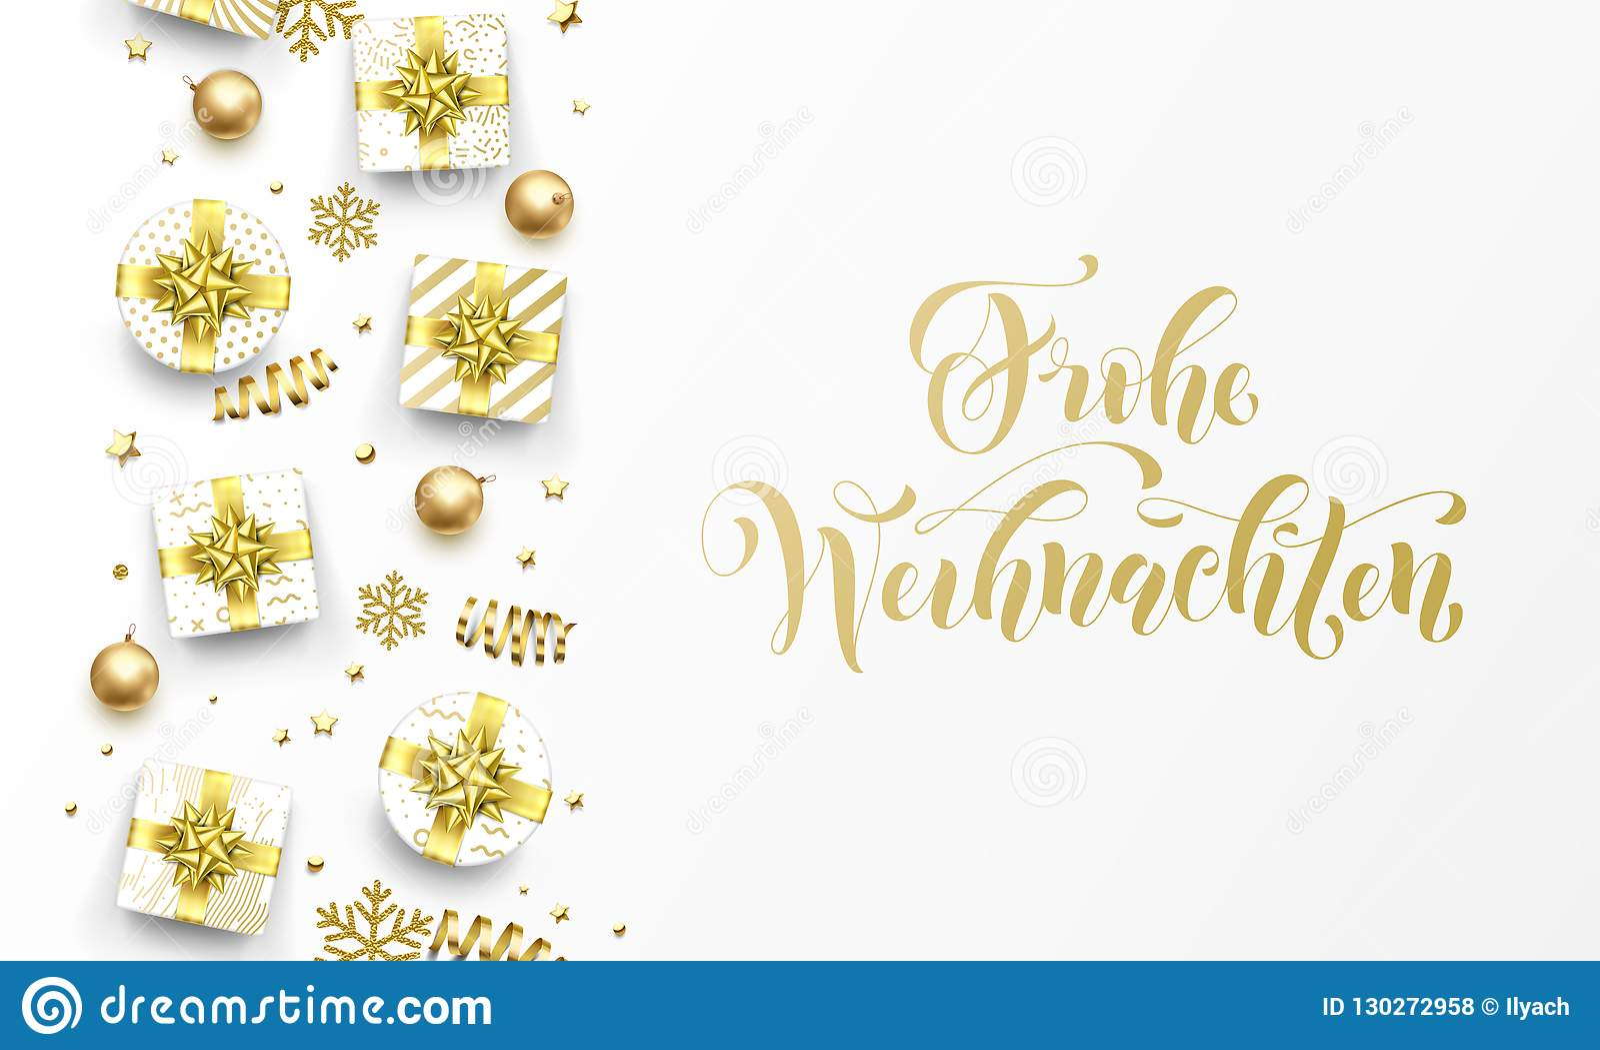 Frohe Weihnachten Gold.Frohe Weihnachten Merry Christmas Golden German Greeting Card Of